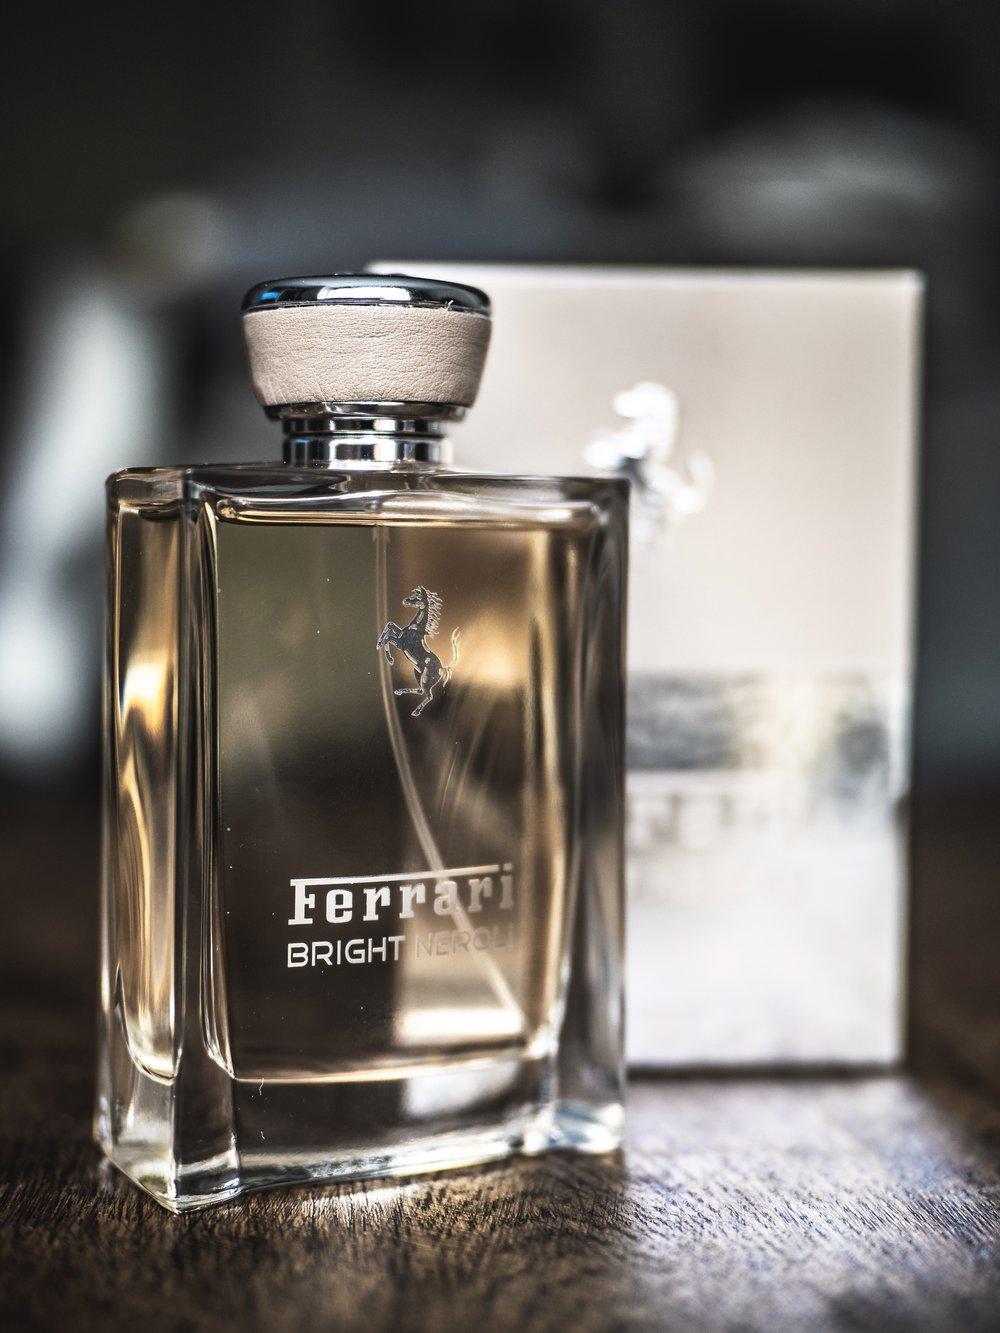 Fragrance Review Ferrari Bright Neroli Jay Mclaughlin Photographer